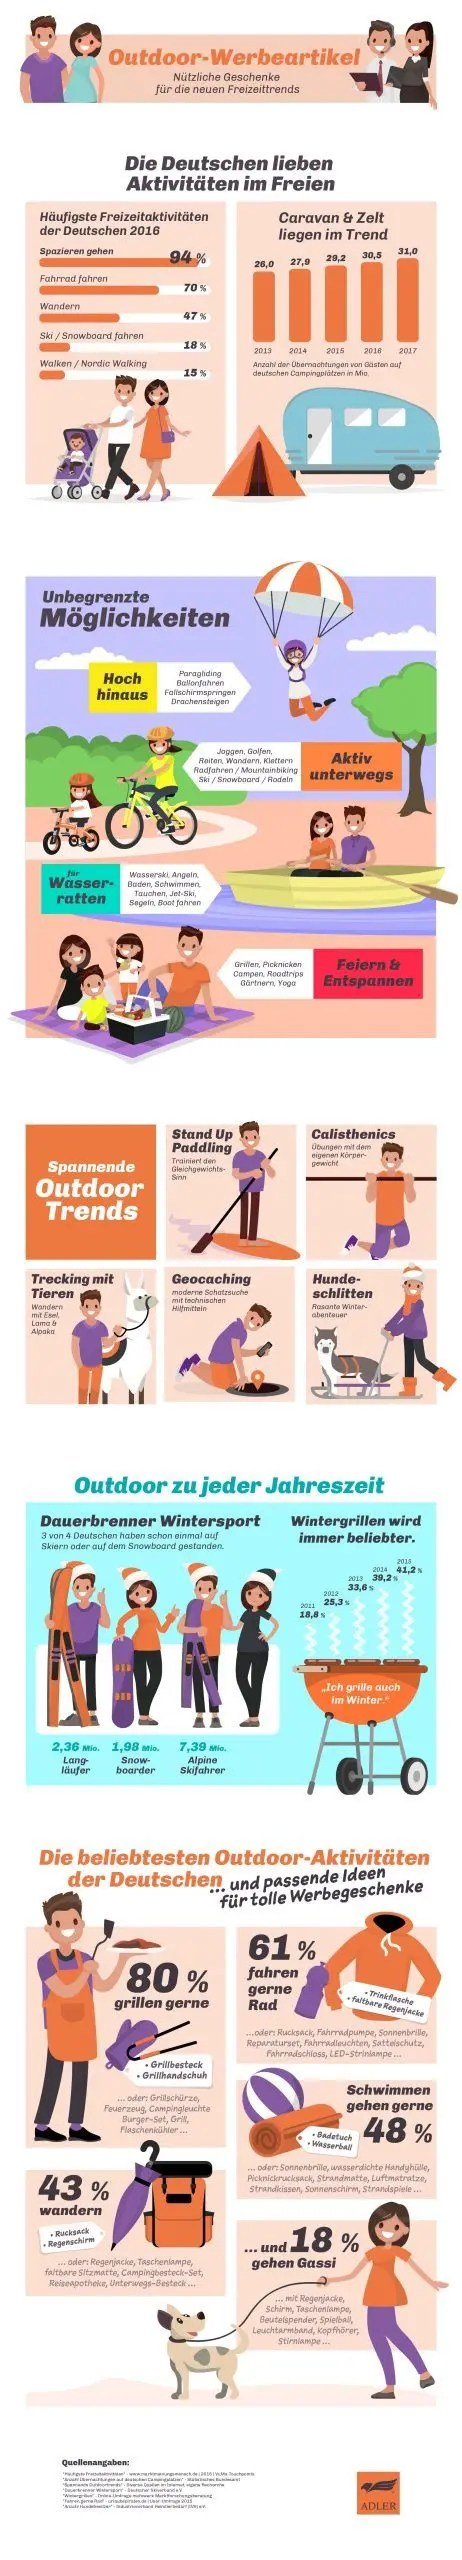 Infografik Outdoor-Werbeartikel